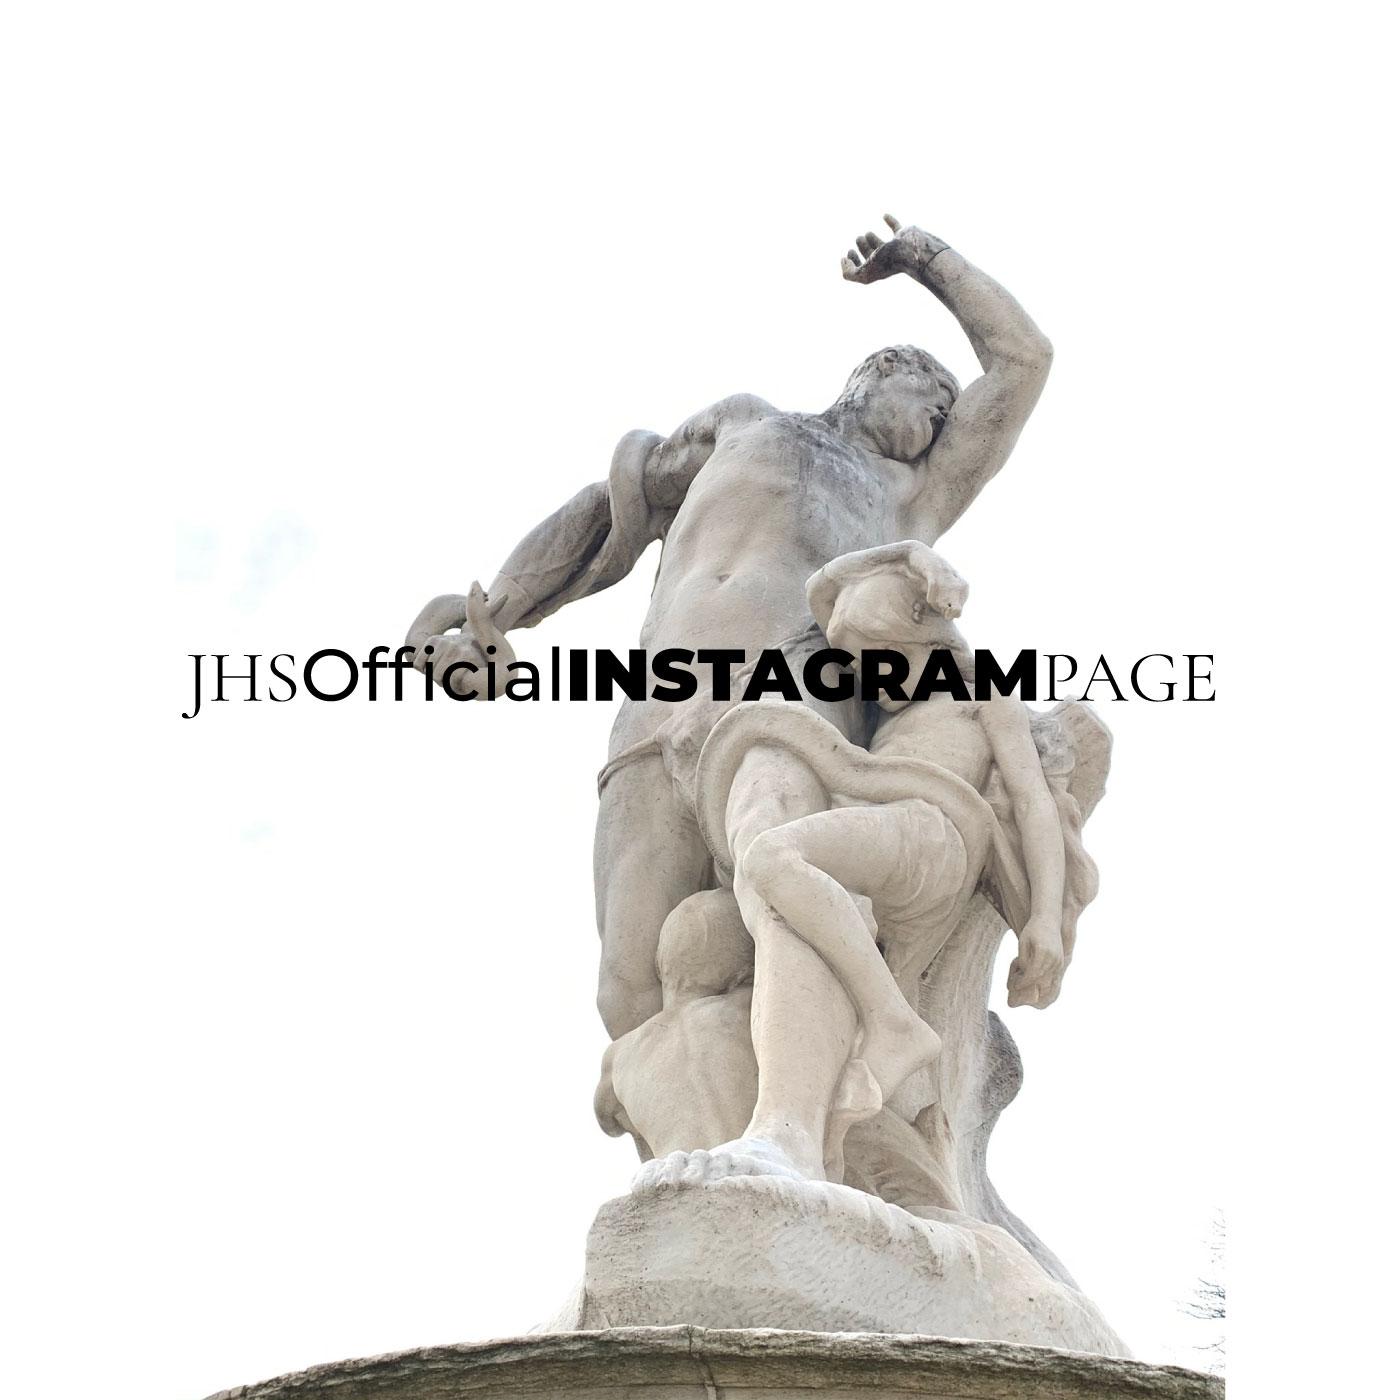 JHS Instagram